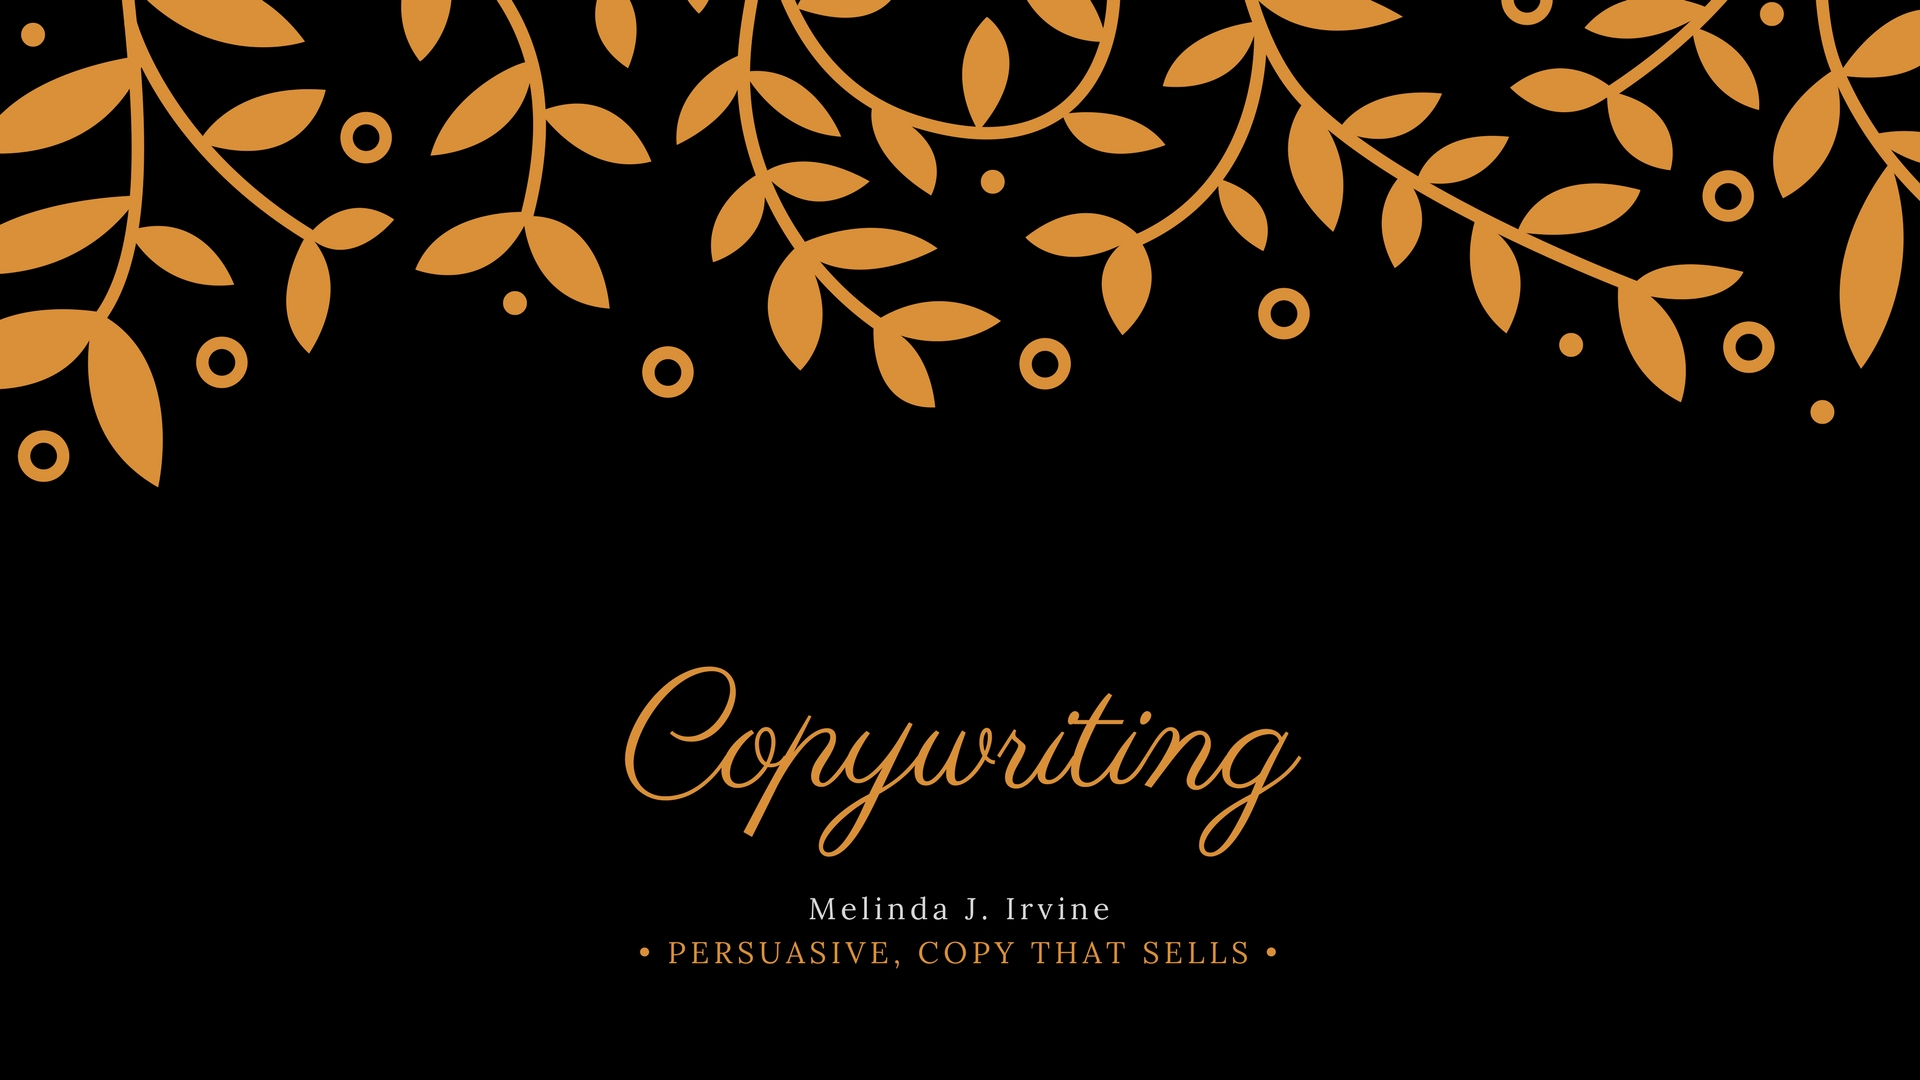 Melinda J. Irvine Professional Copywriting Service